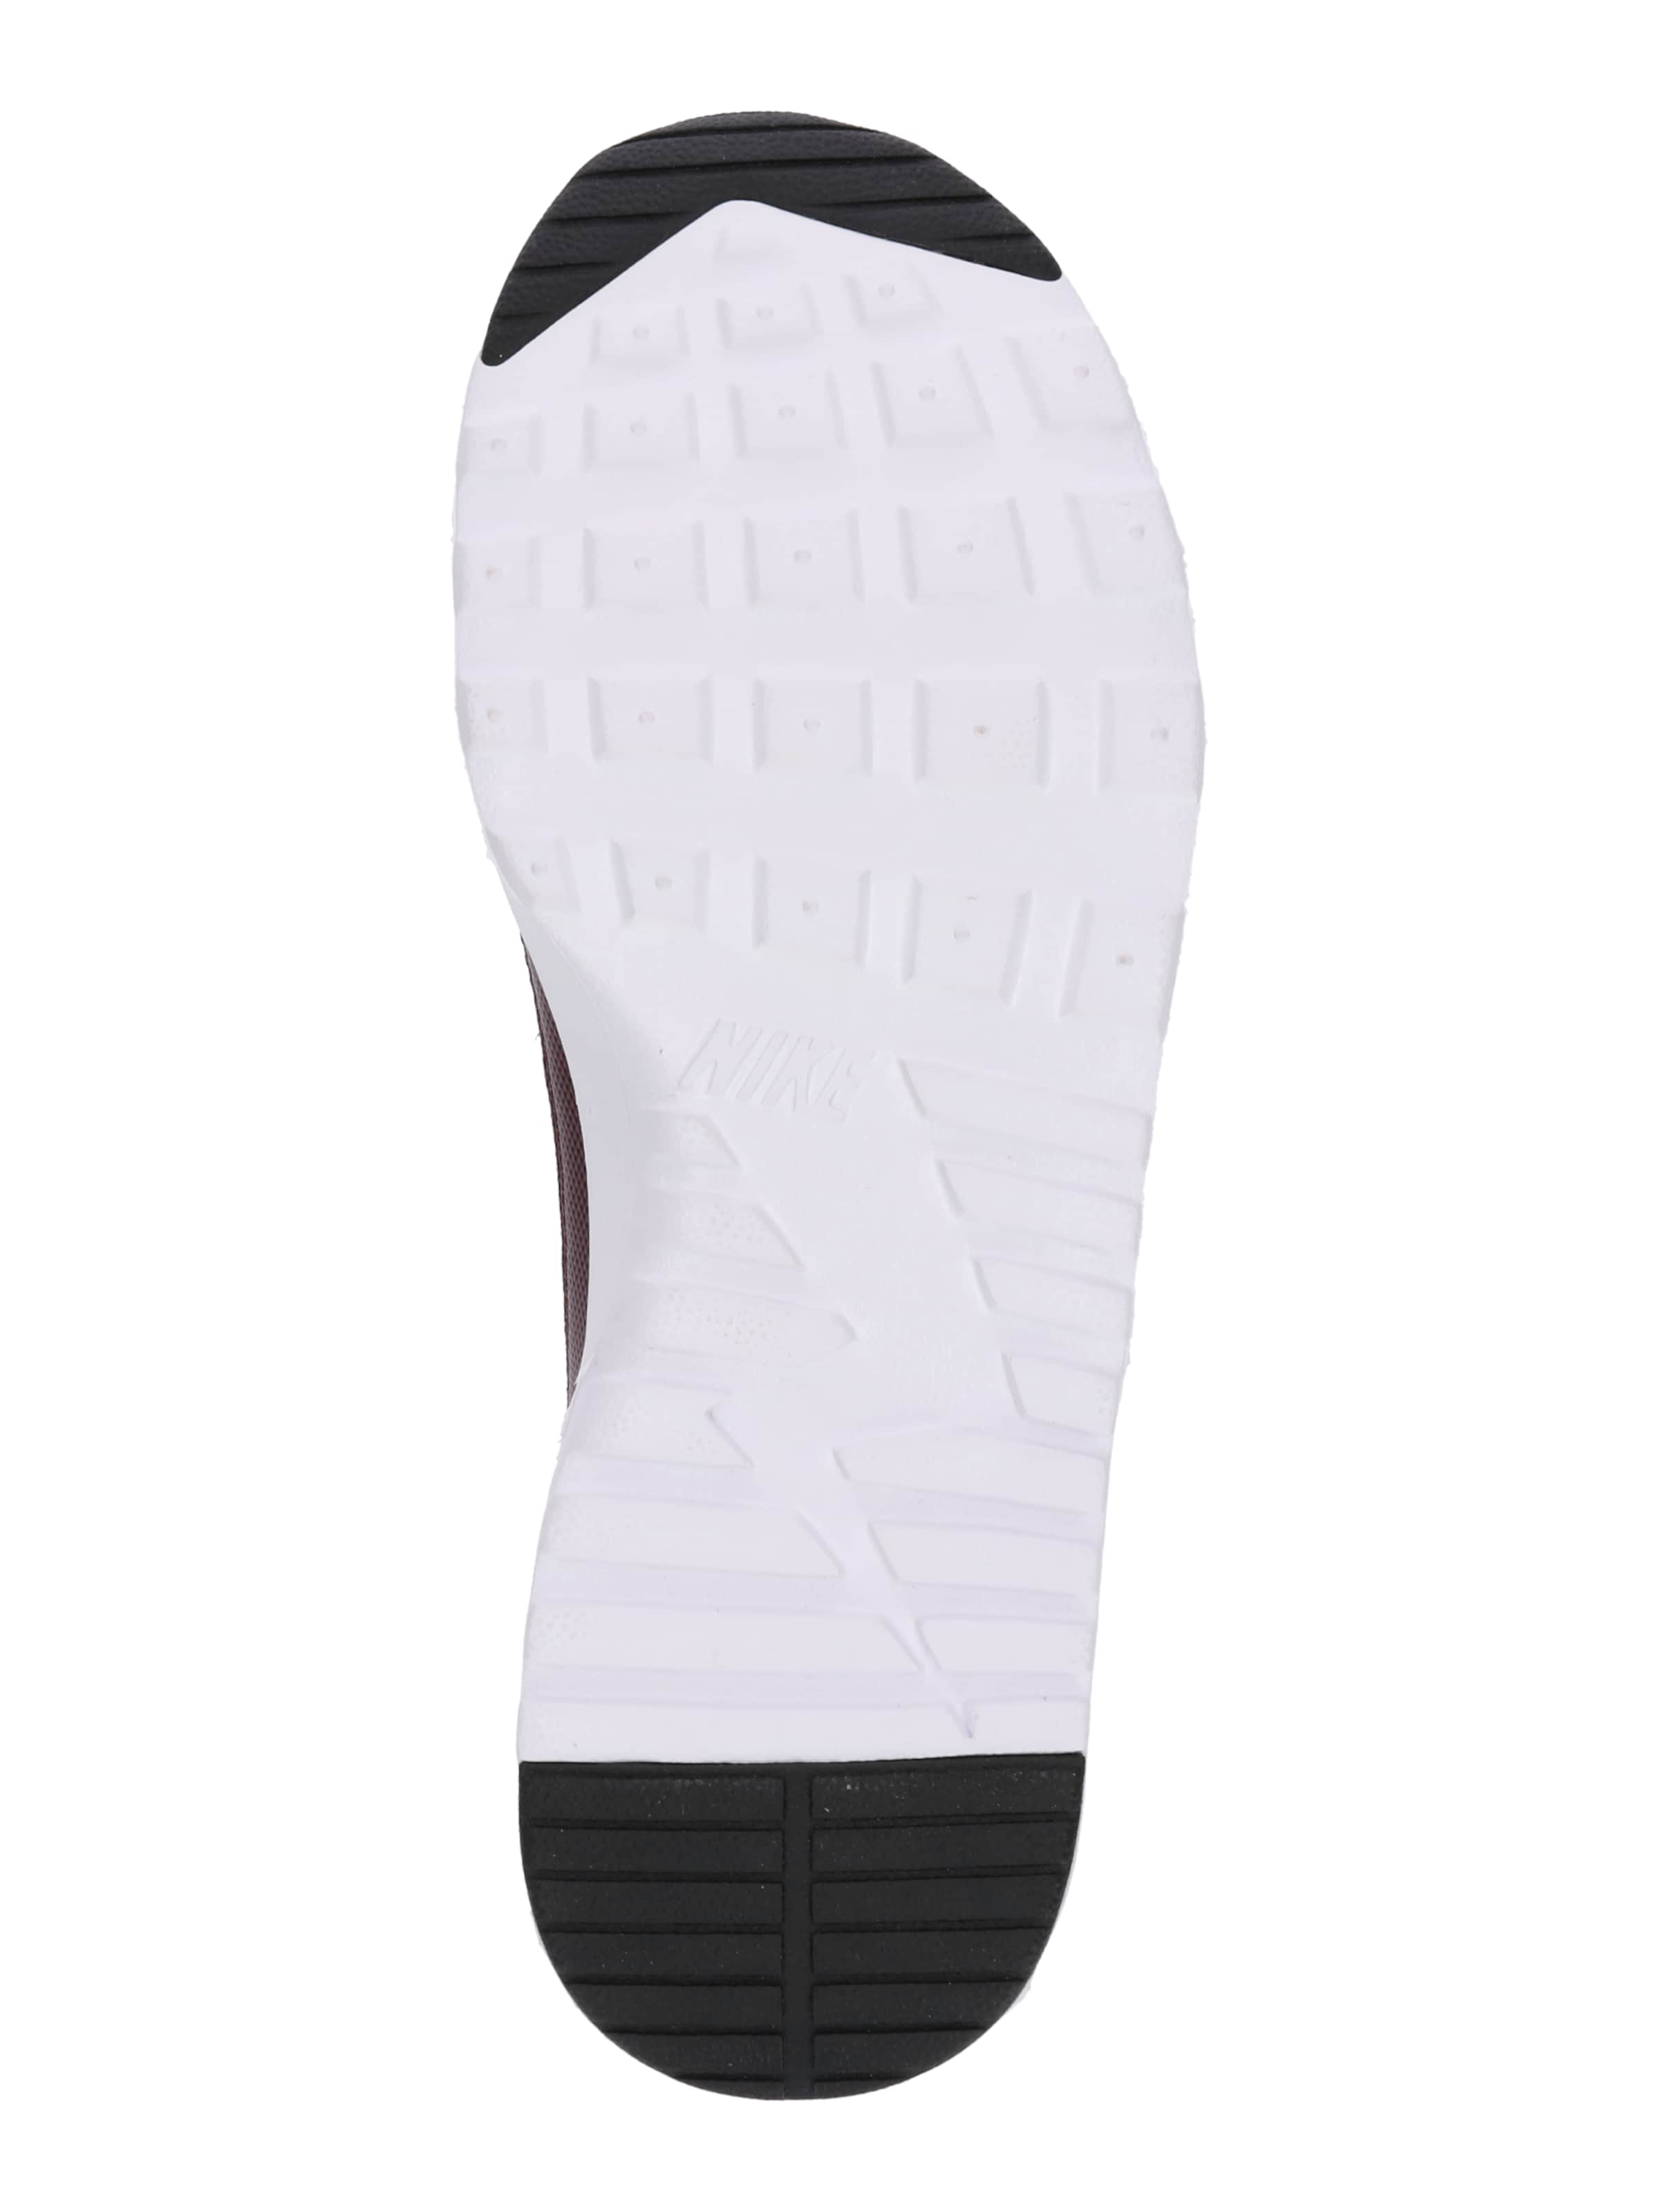 'air Thea' Low Sportswear Sneaker In Max Nike RotBurgunder UMpSzVqG